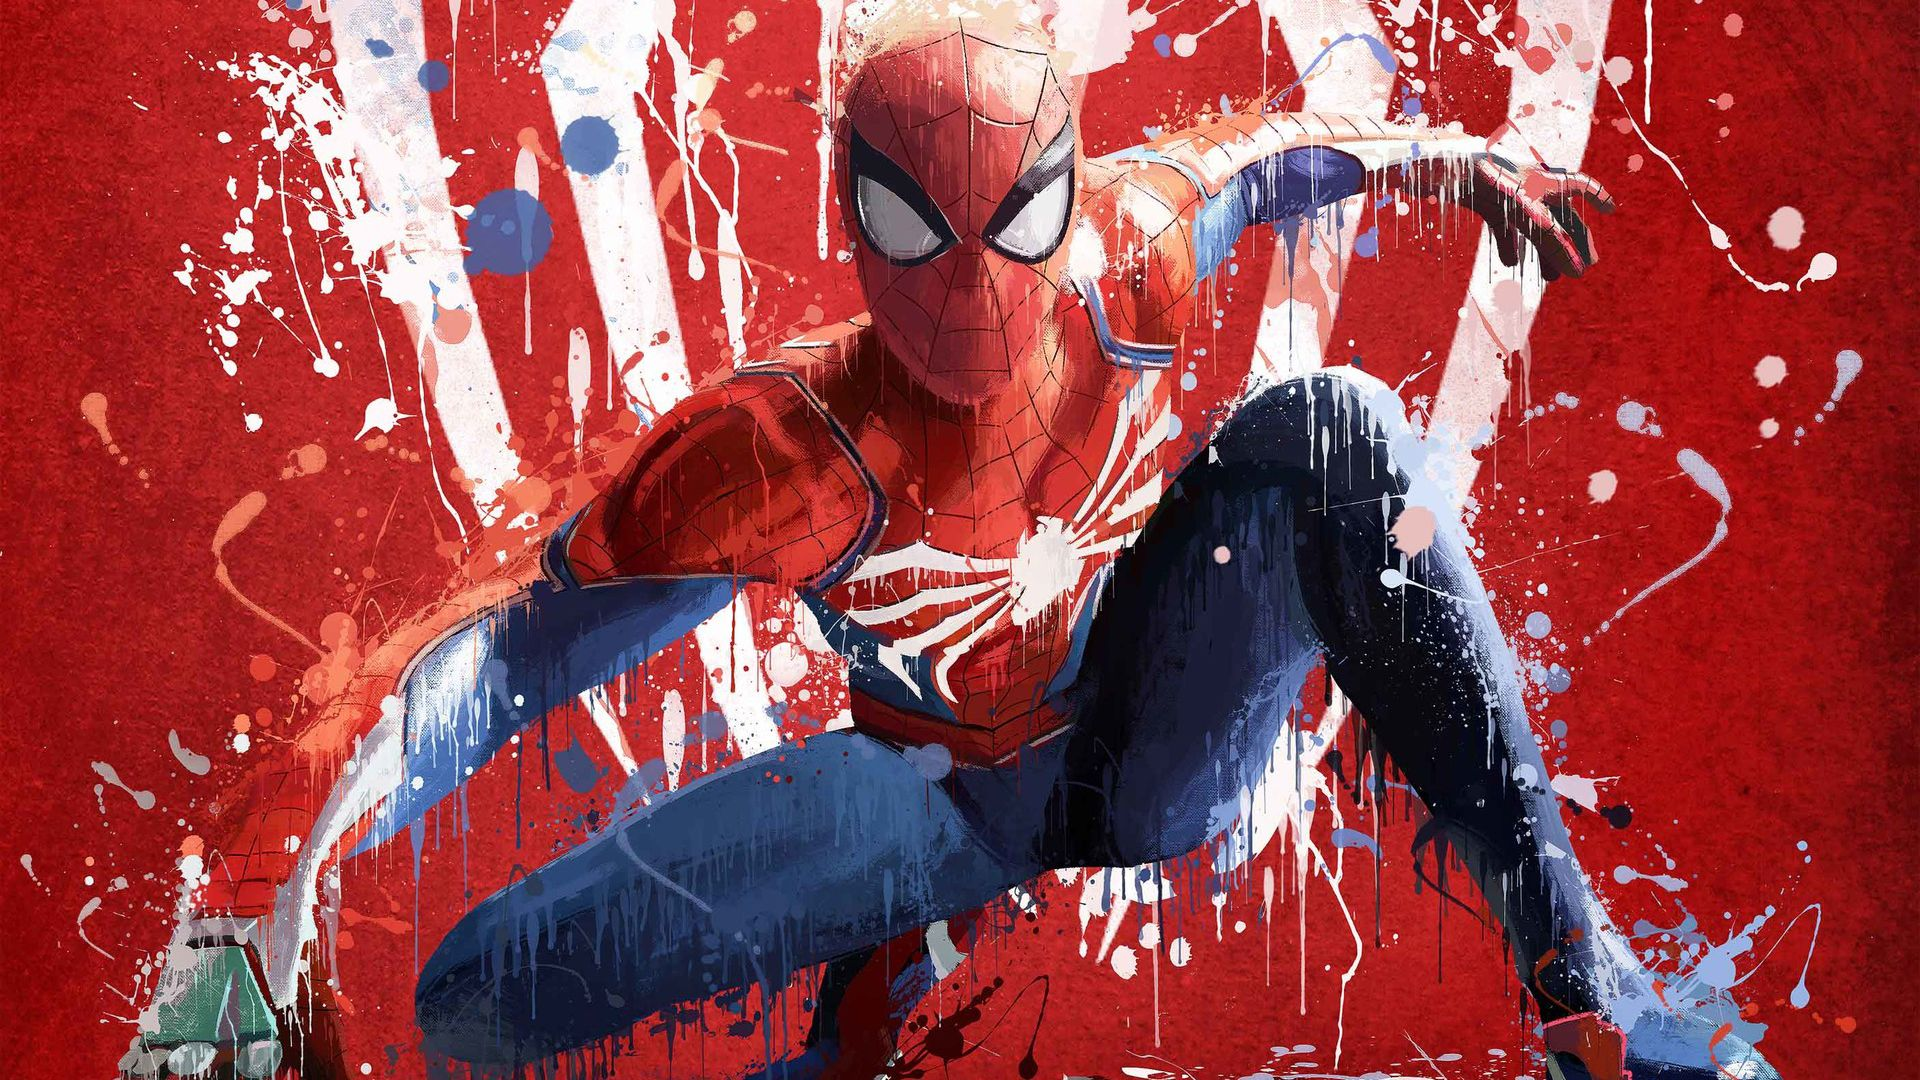 Spiderman Splash Art 90x60cm Leinwandbild Vintage Aquarell Wandbilder Caro Art